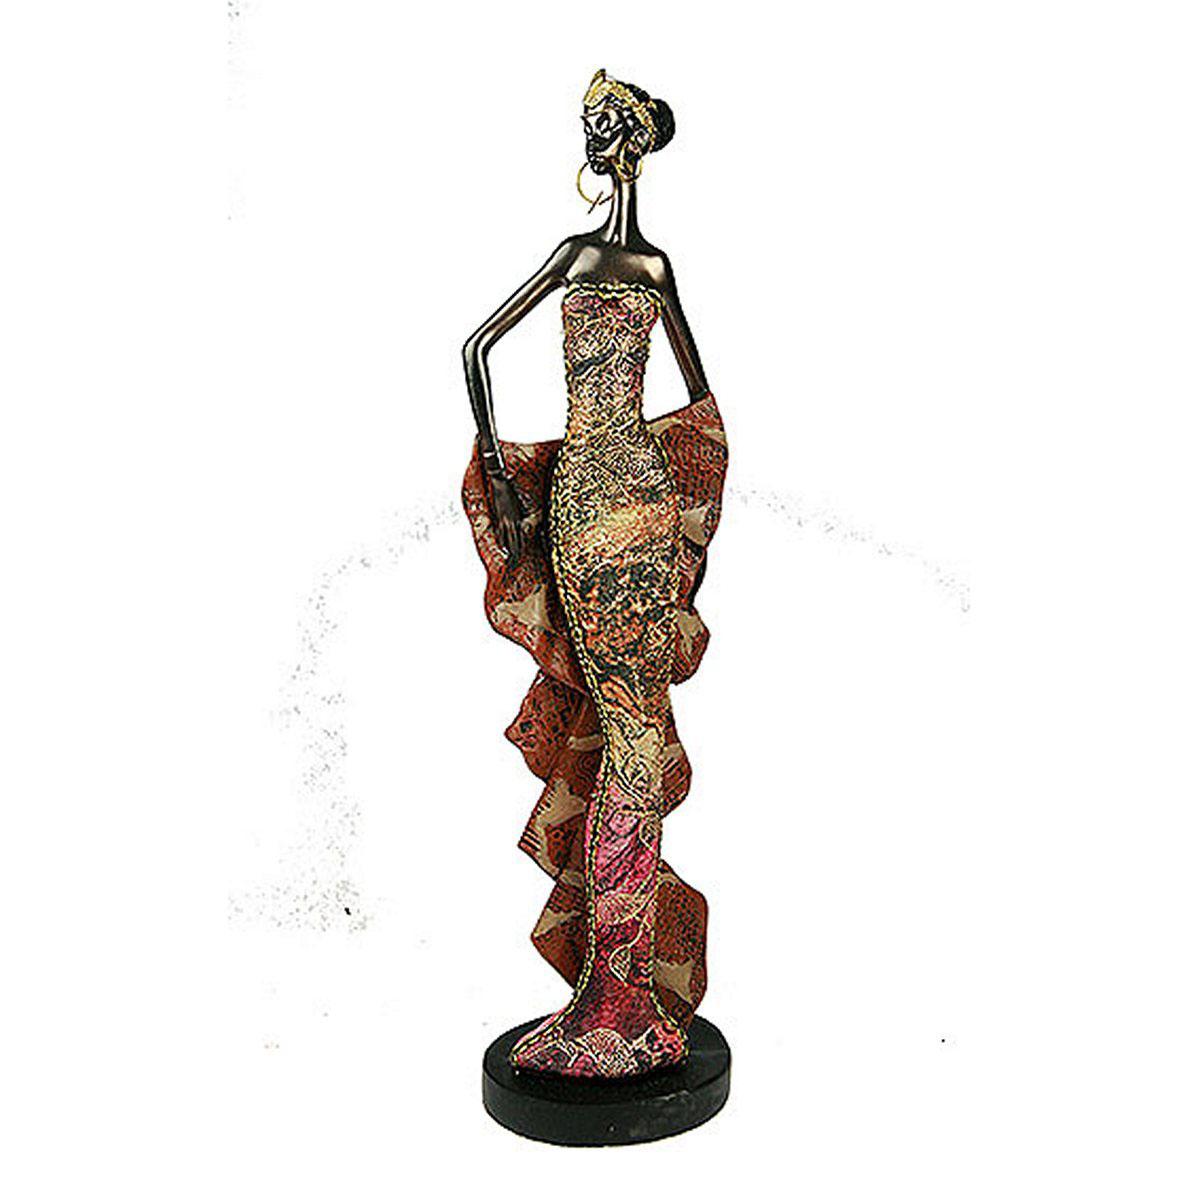 Статуэтка Русские Подарки Африканка, 7 х 9 х 33 см20612